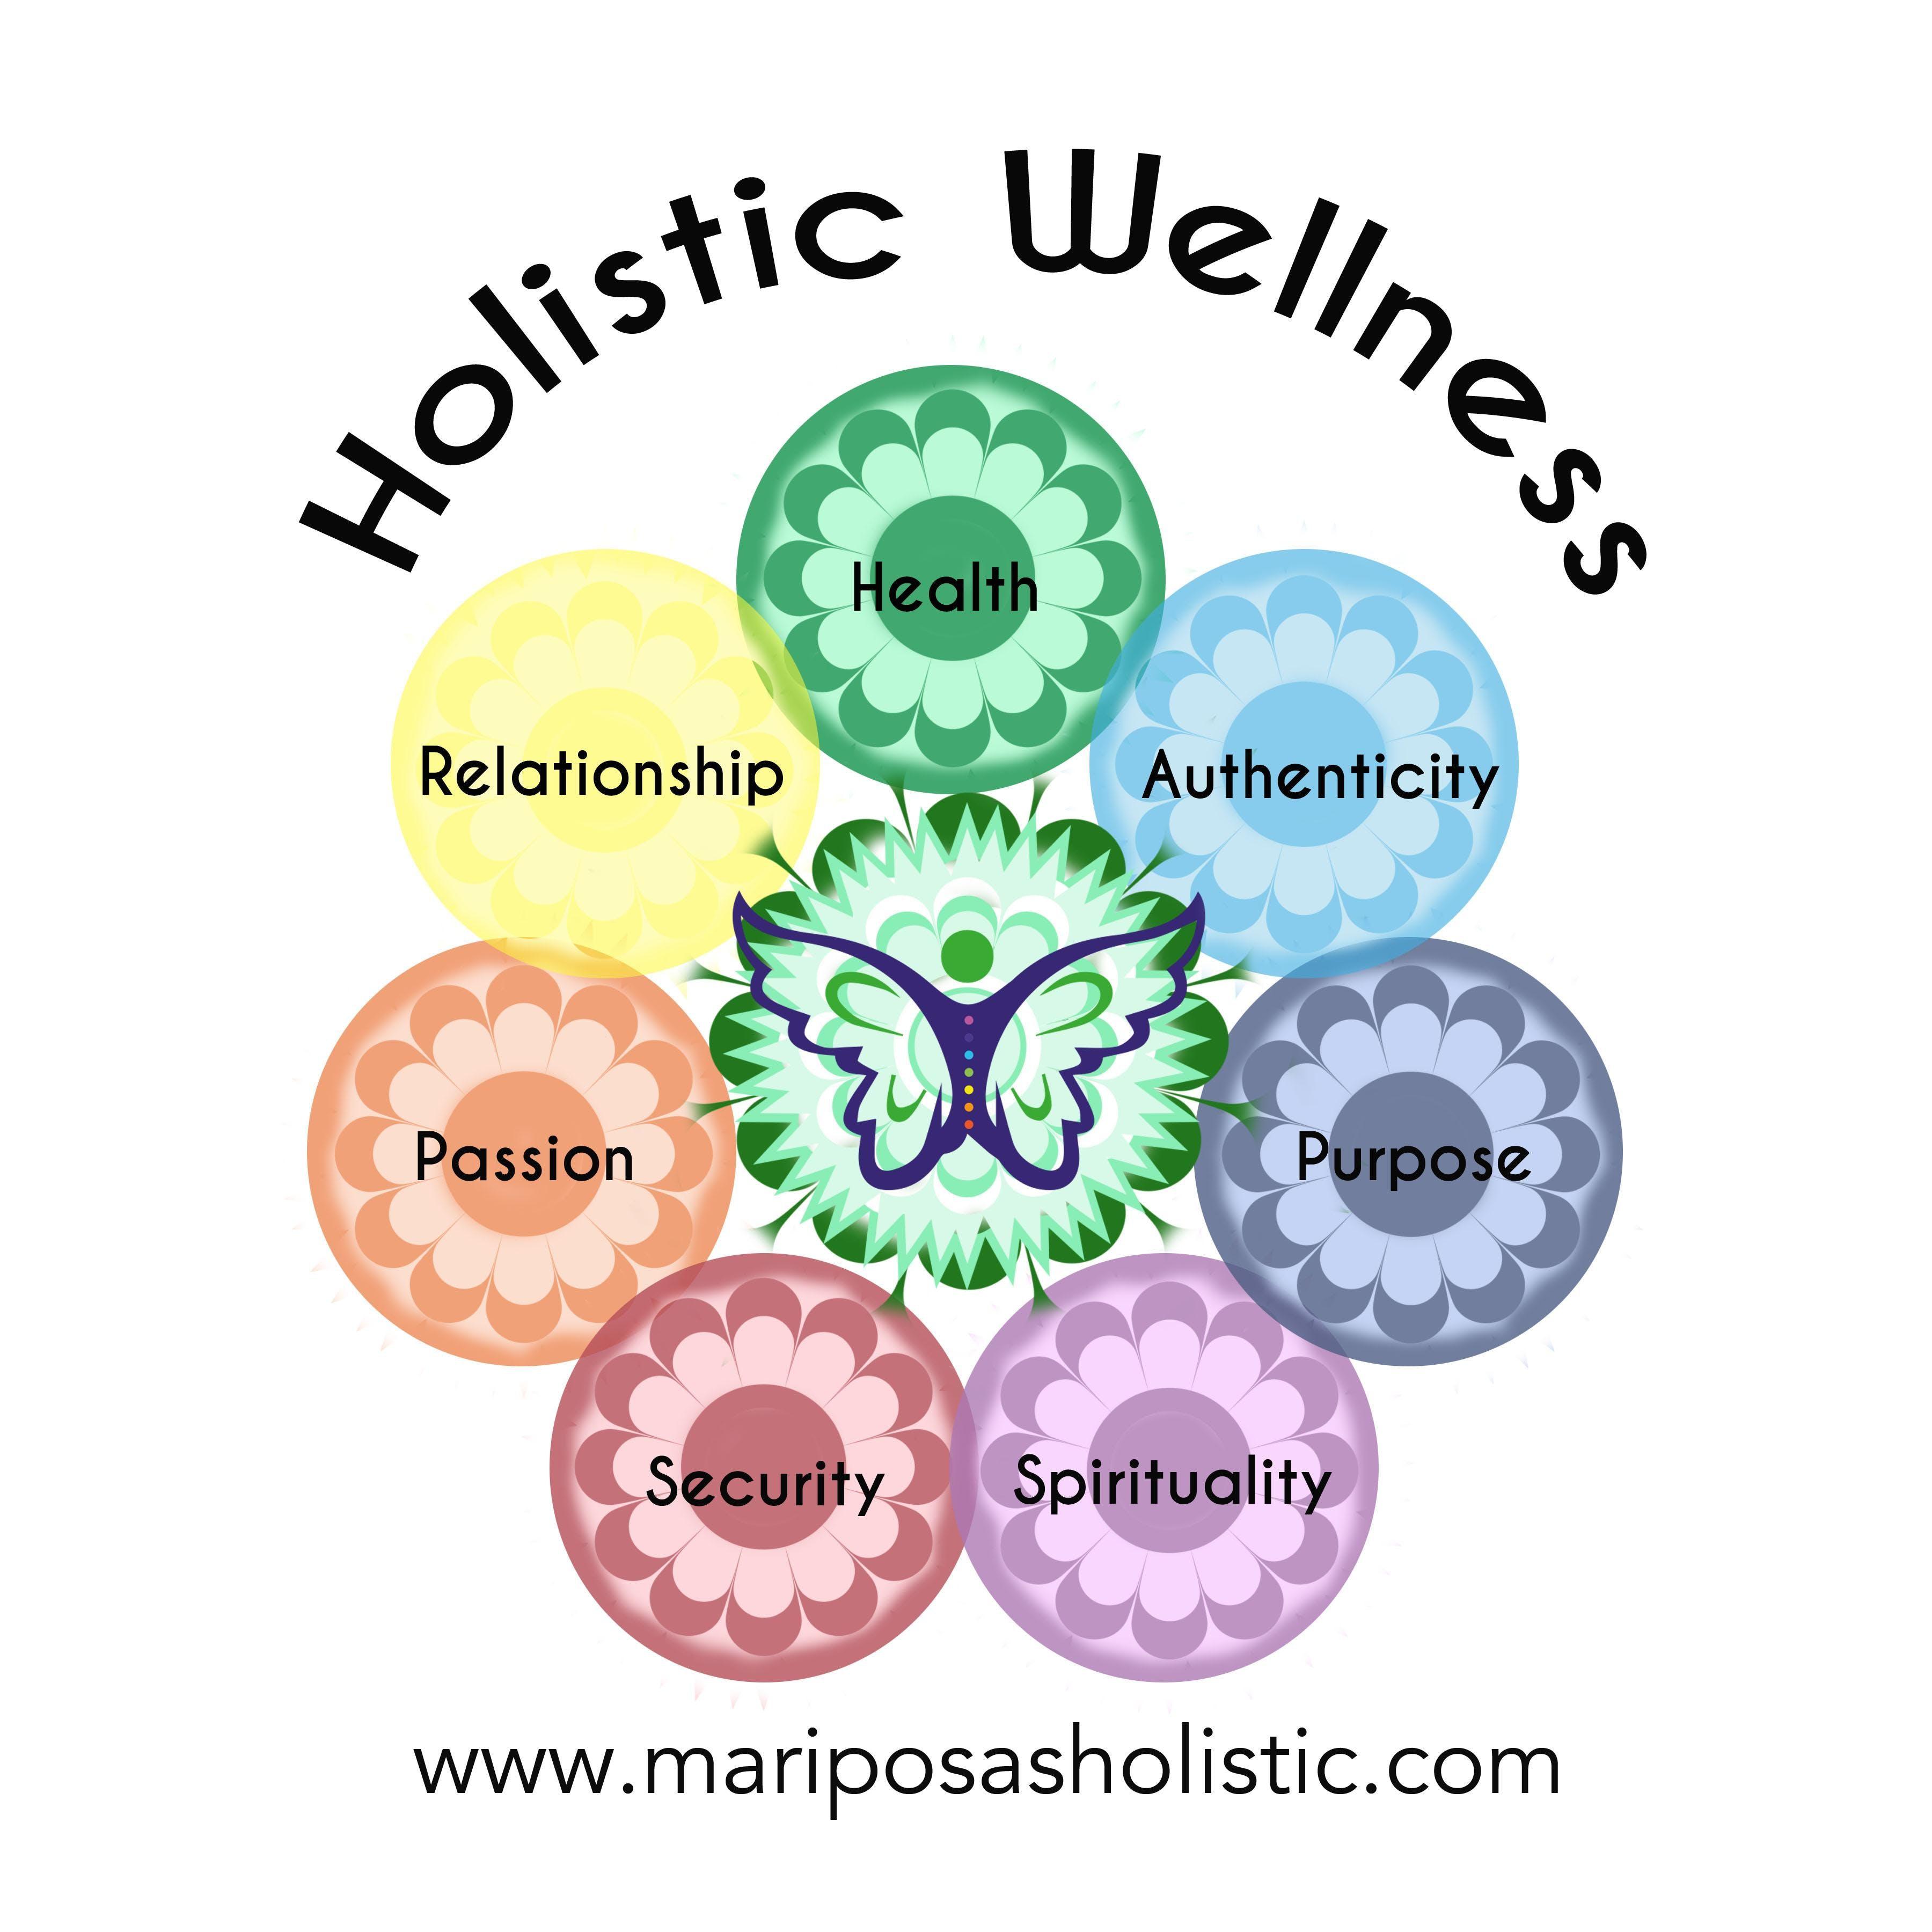 Holistic Wellness 2019 Goal Creation 21 Dec 2018